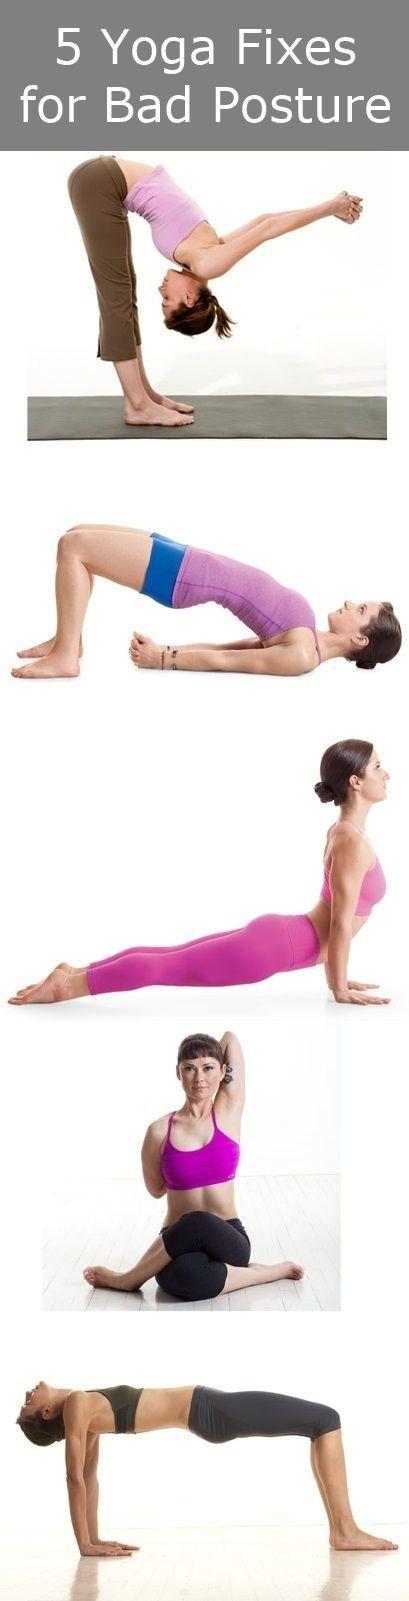 Bad posture yoga fixes